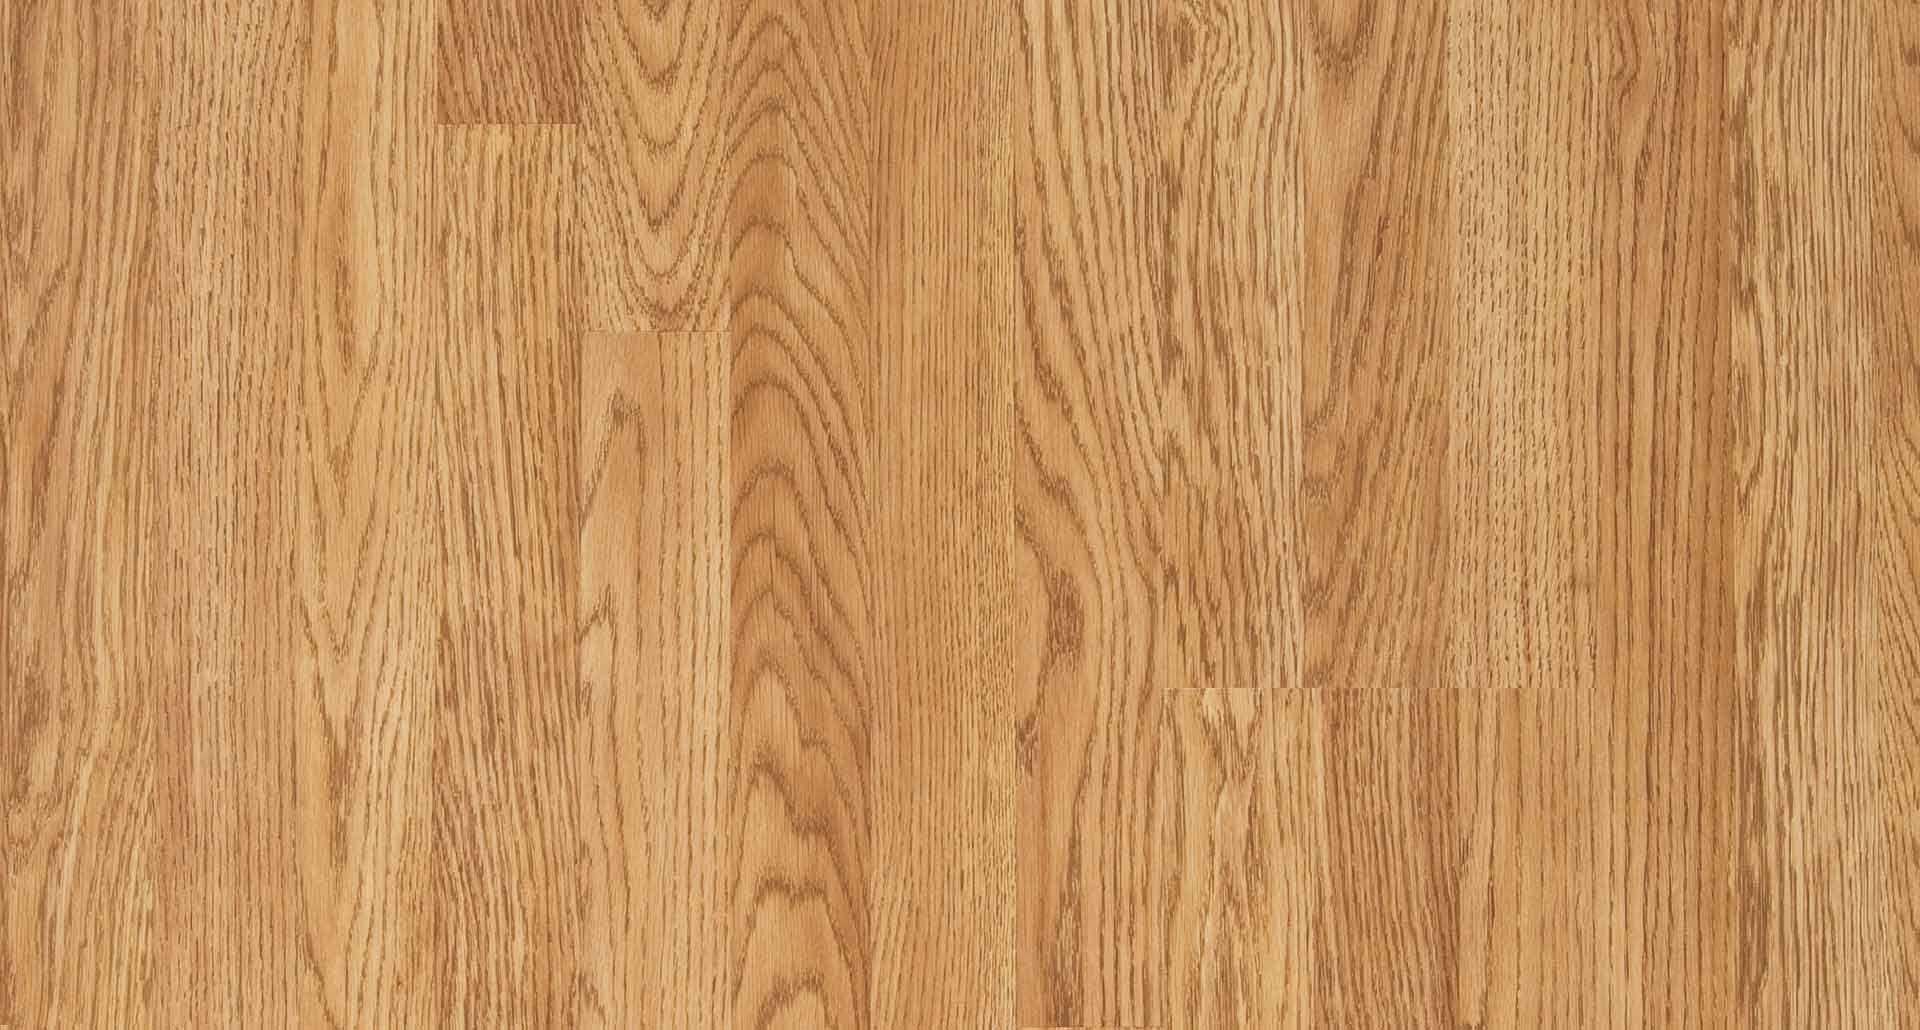 Grand Oak Textured Pergo Xp Laminate Flooring Pergo Flooring Pergo Laminate Flooring Laminate Flooring Mahogany Flooring